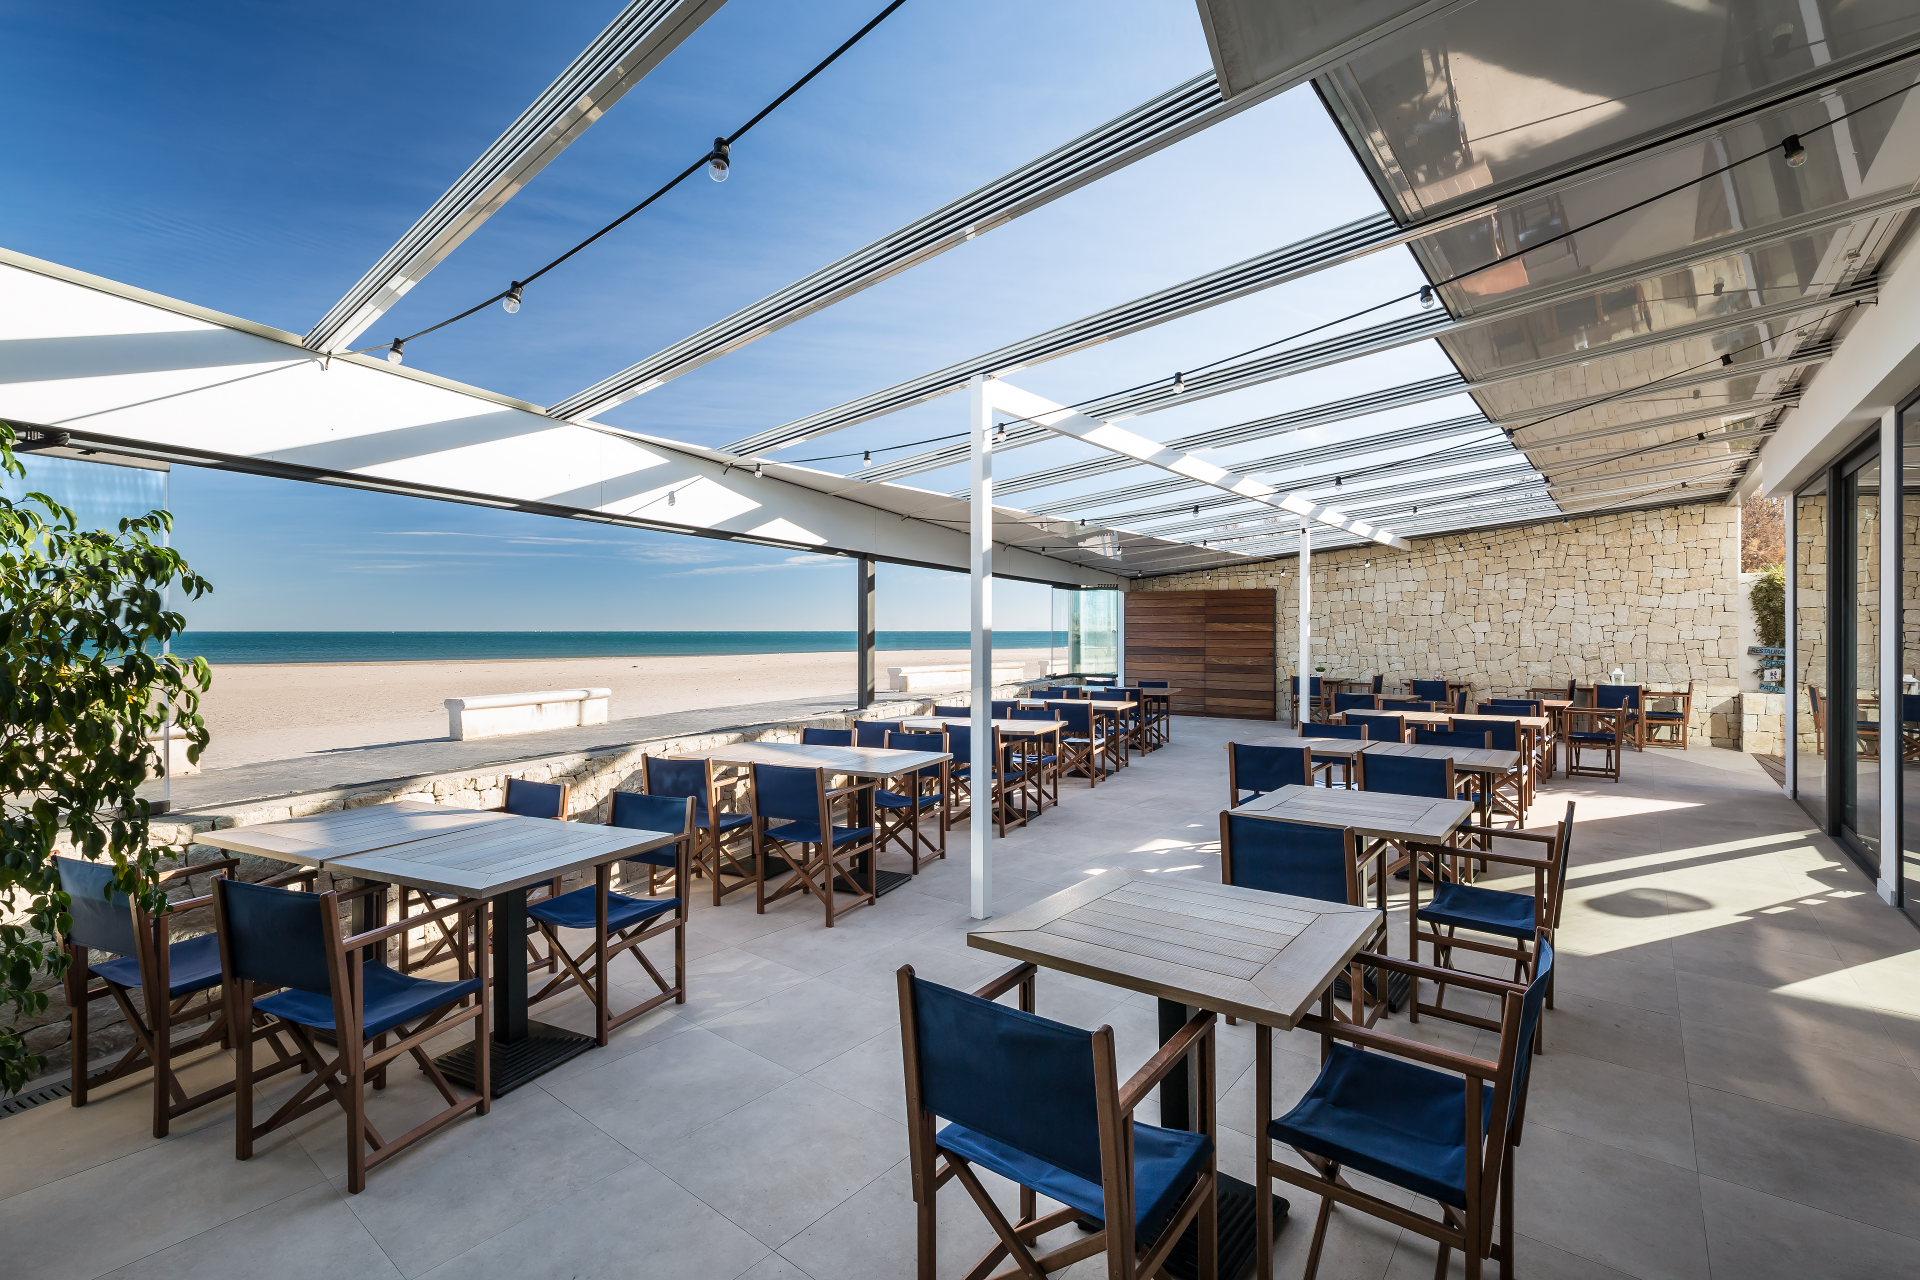 fotografia-arquitectura-valencia-german-cabo-versea-restaurante-ferrera-pinedo (9)